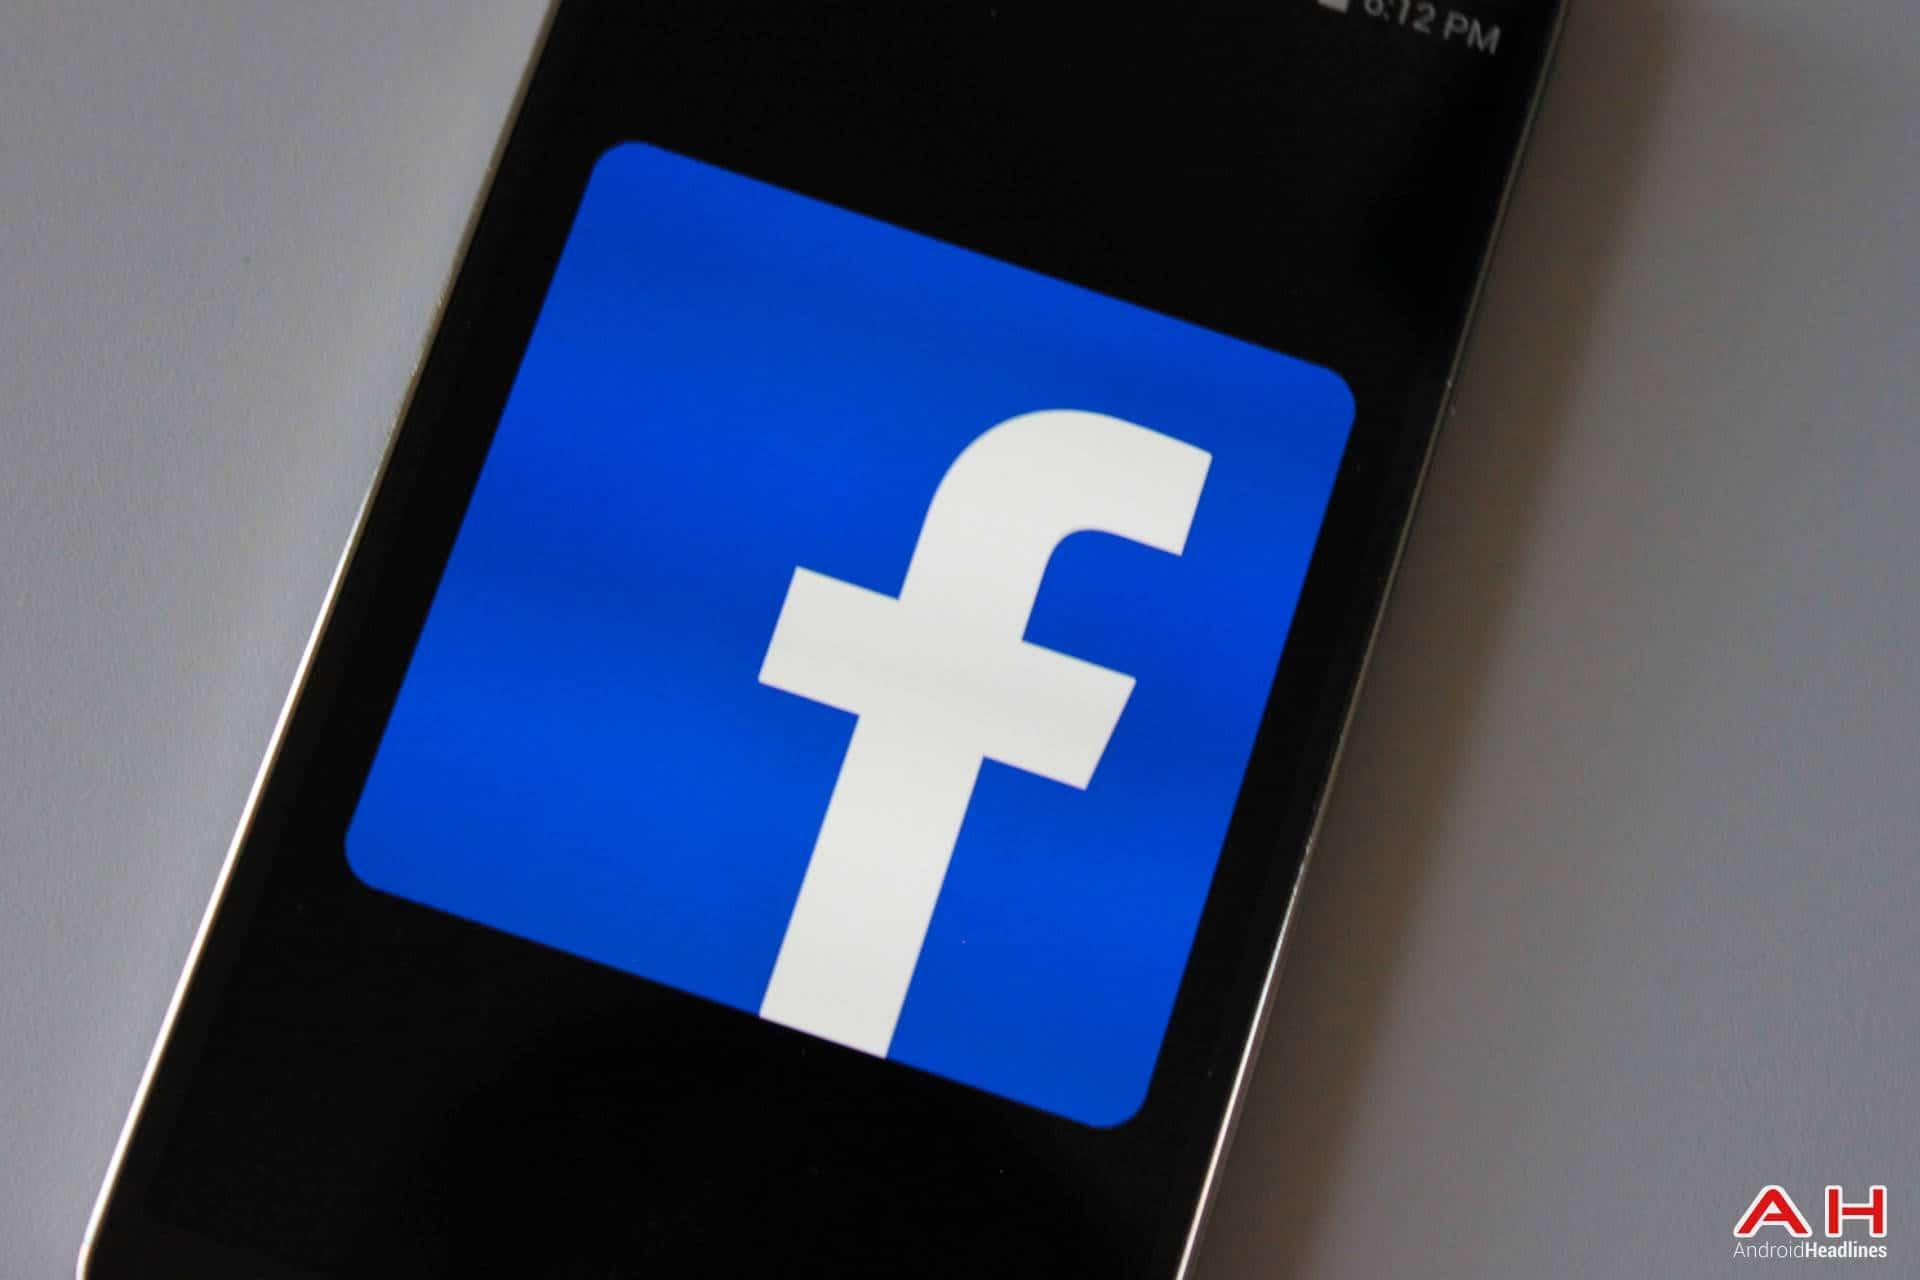 AH Facebook logo 1.1